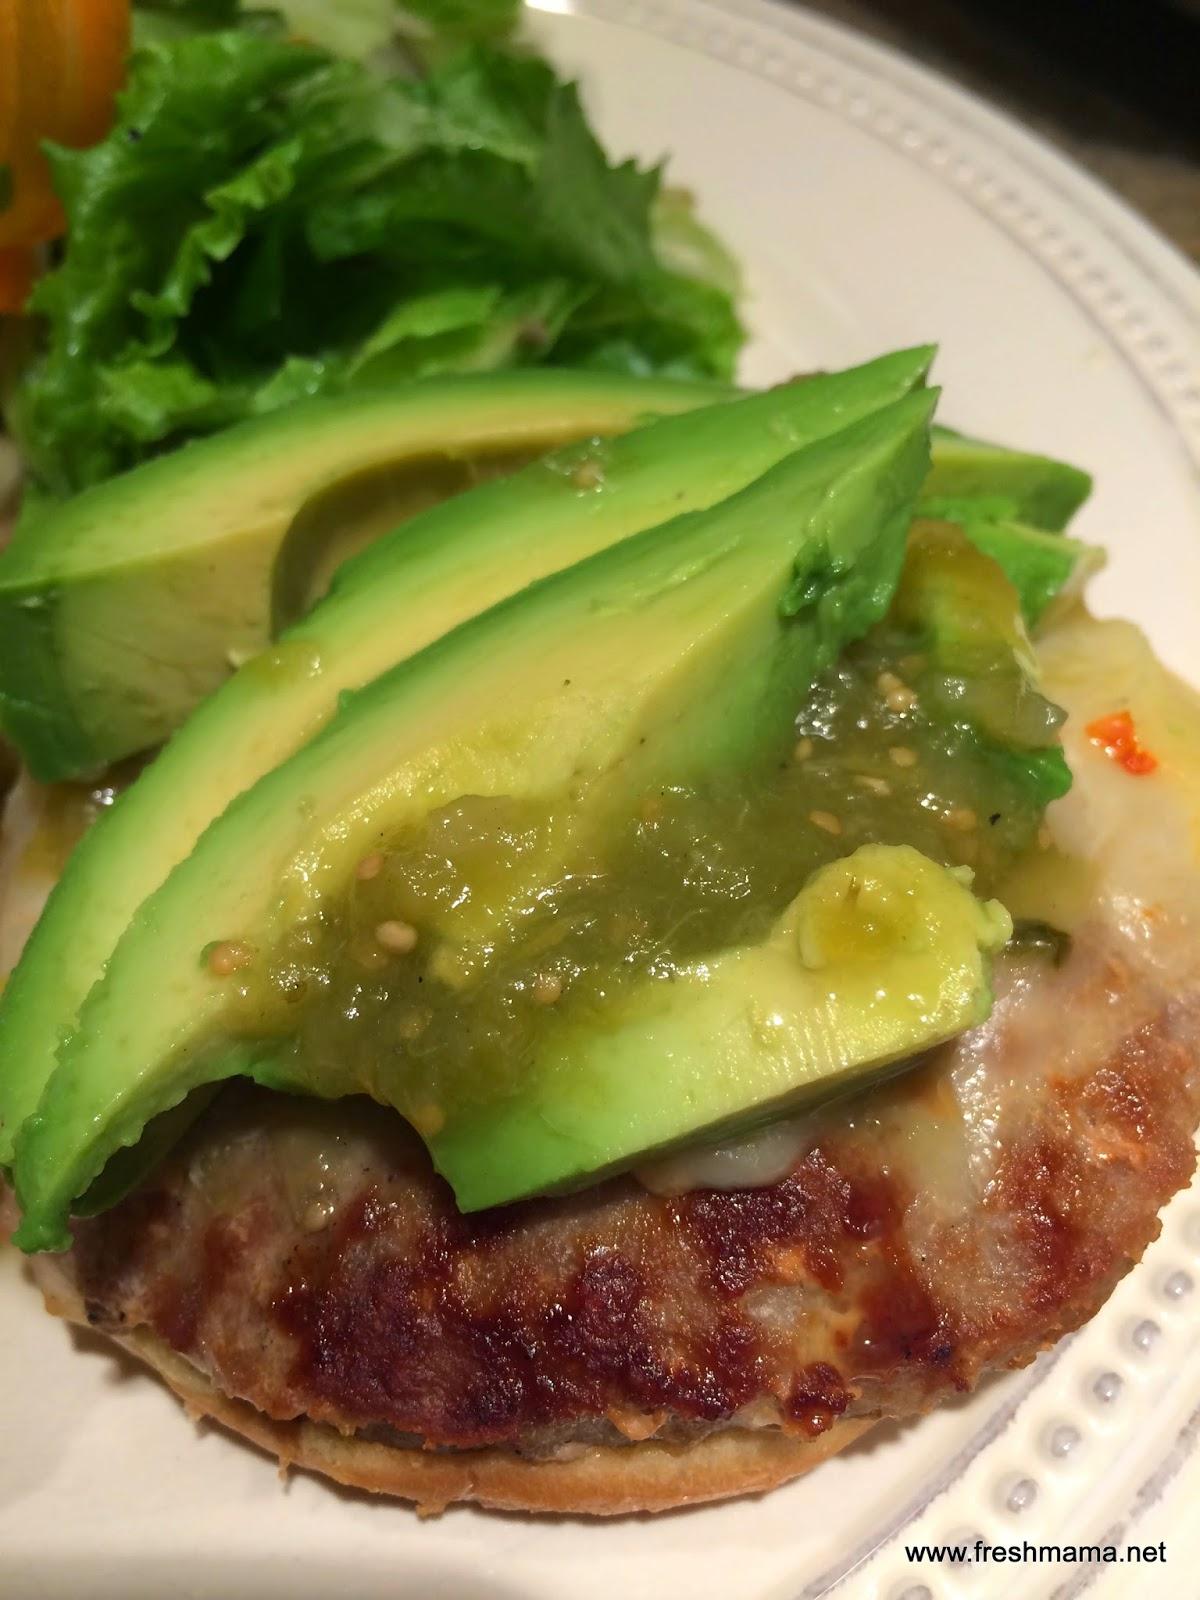 Fresh Mama Fitness and Health: Salsa Verde Turkey Burgers